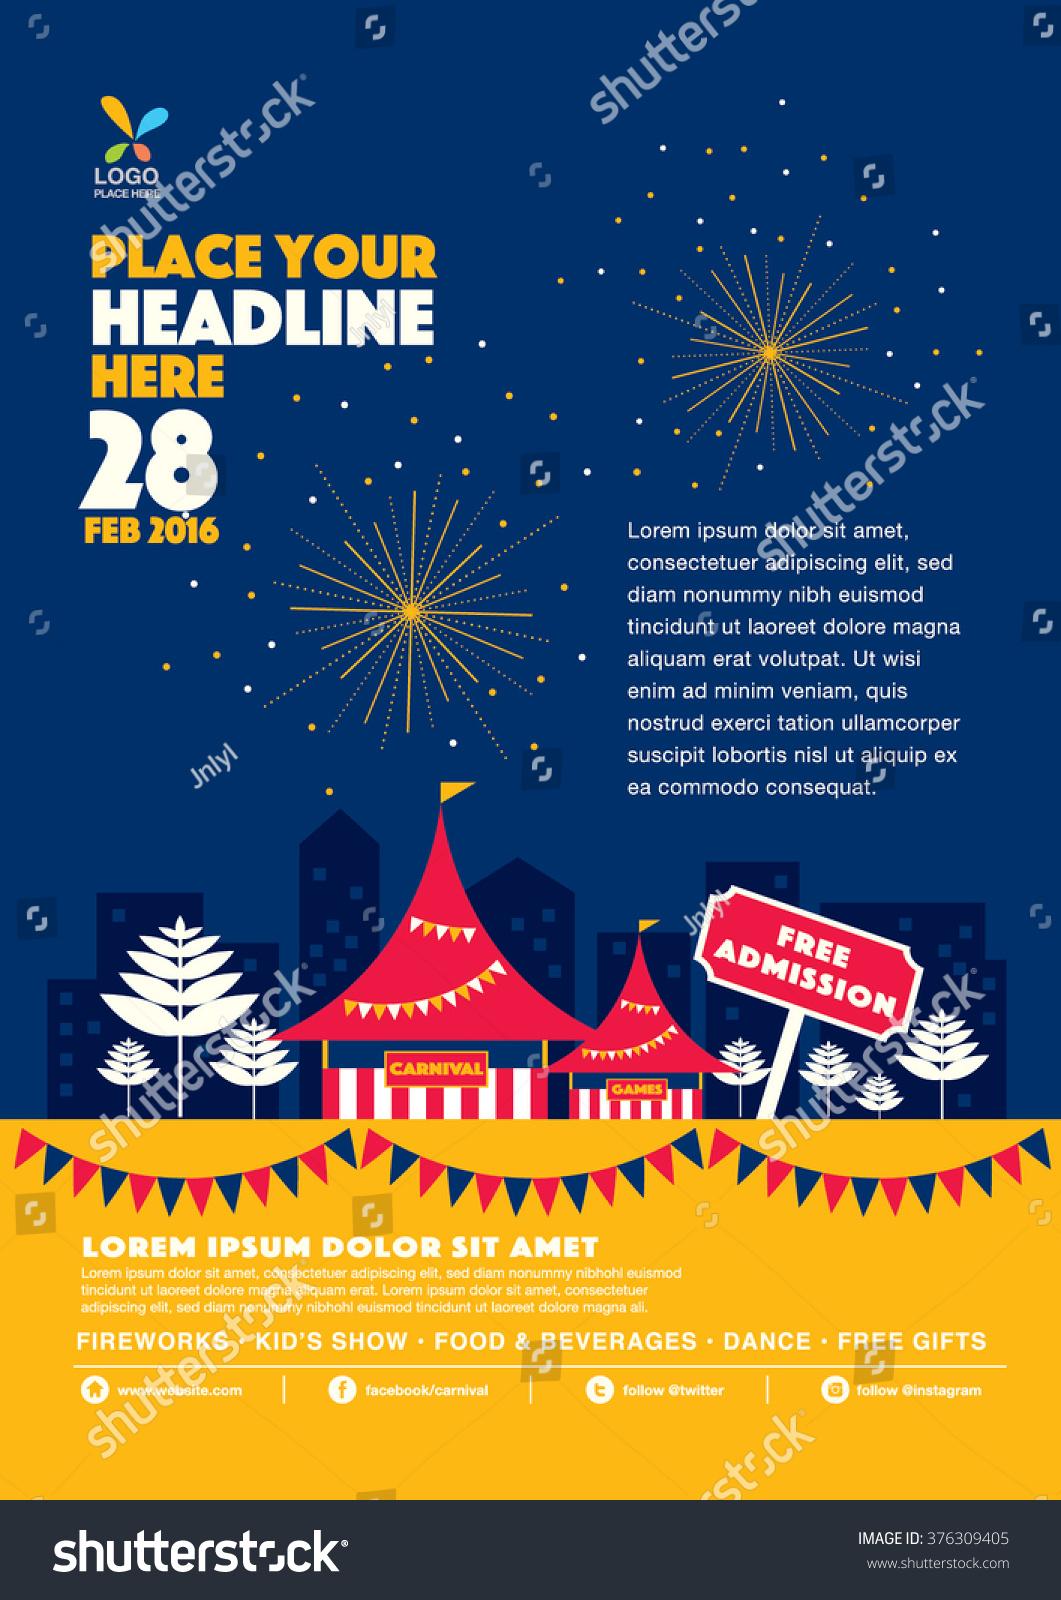 Elements of a poster design - Carnival Theme Template Design Invitation Amusement Park Elements Info Graphic Poster Design Fun Fair